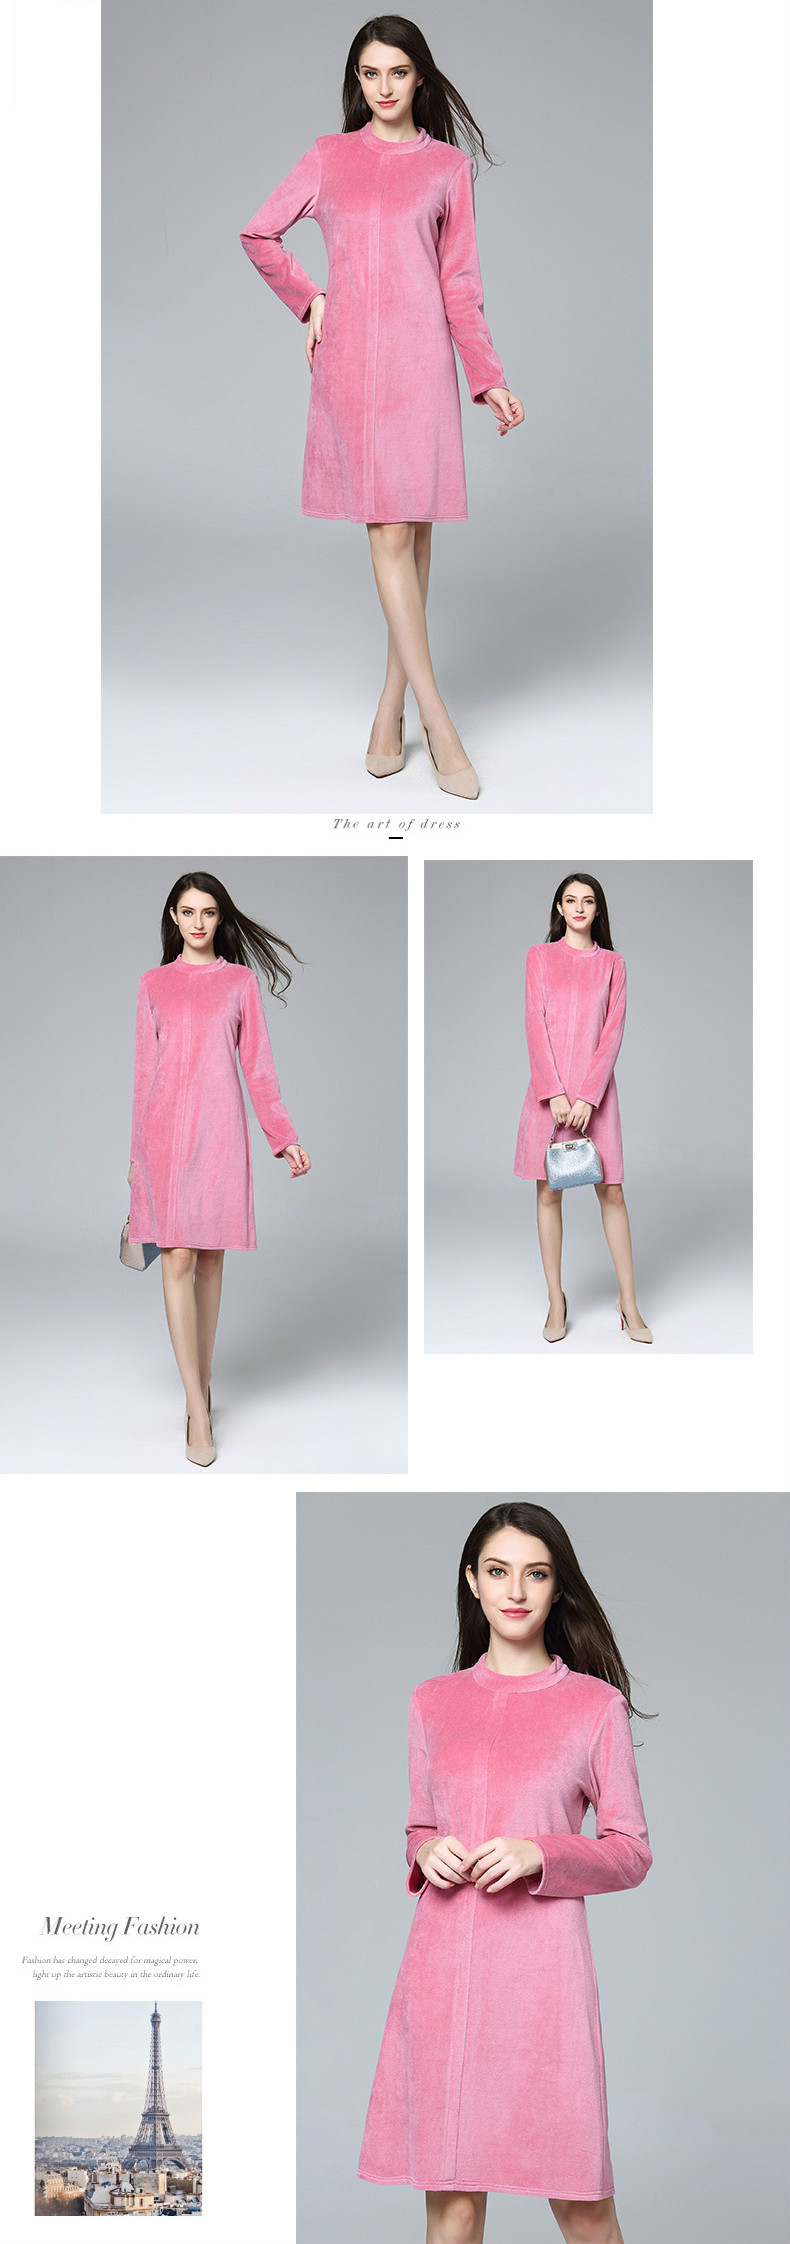 ATOFUL Women Dress Vintage Elegant Simple Solid Pink Velvet Dress ... 0c9dacf6e5c8